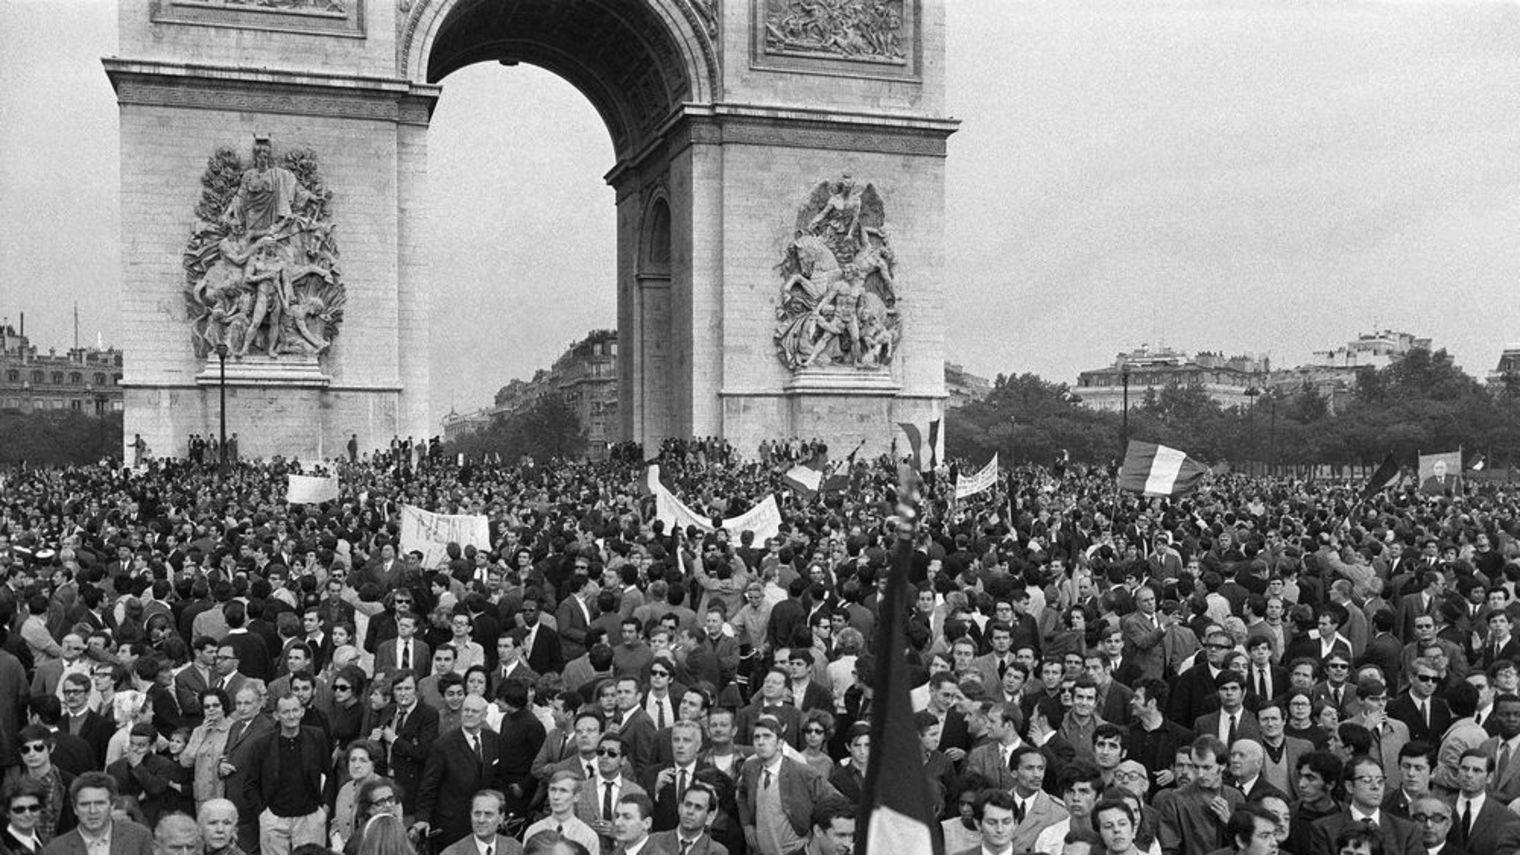 manifestation-de-gaulle-30-mai-1968_1148050